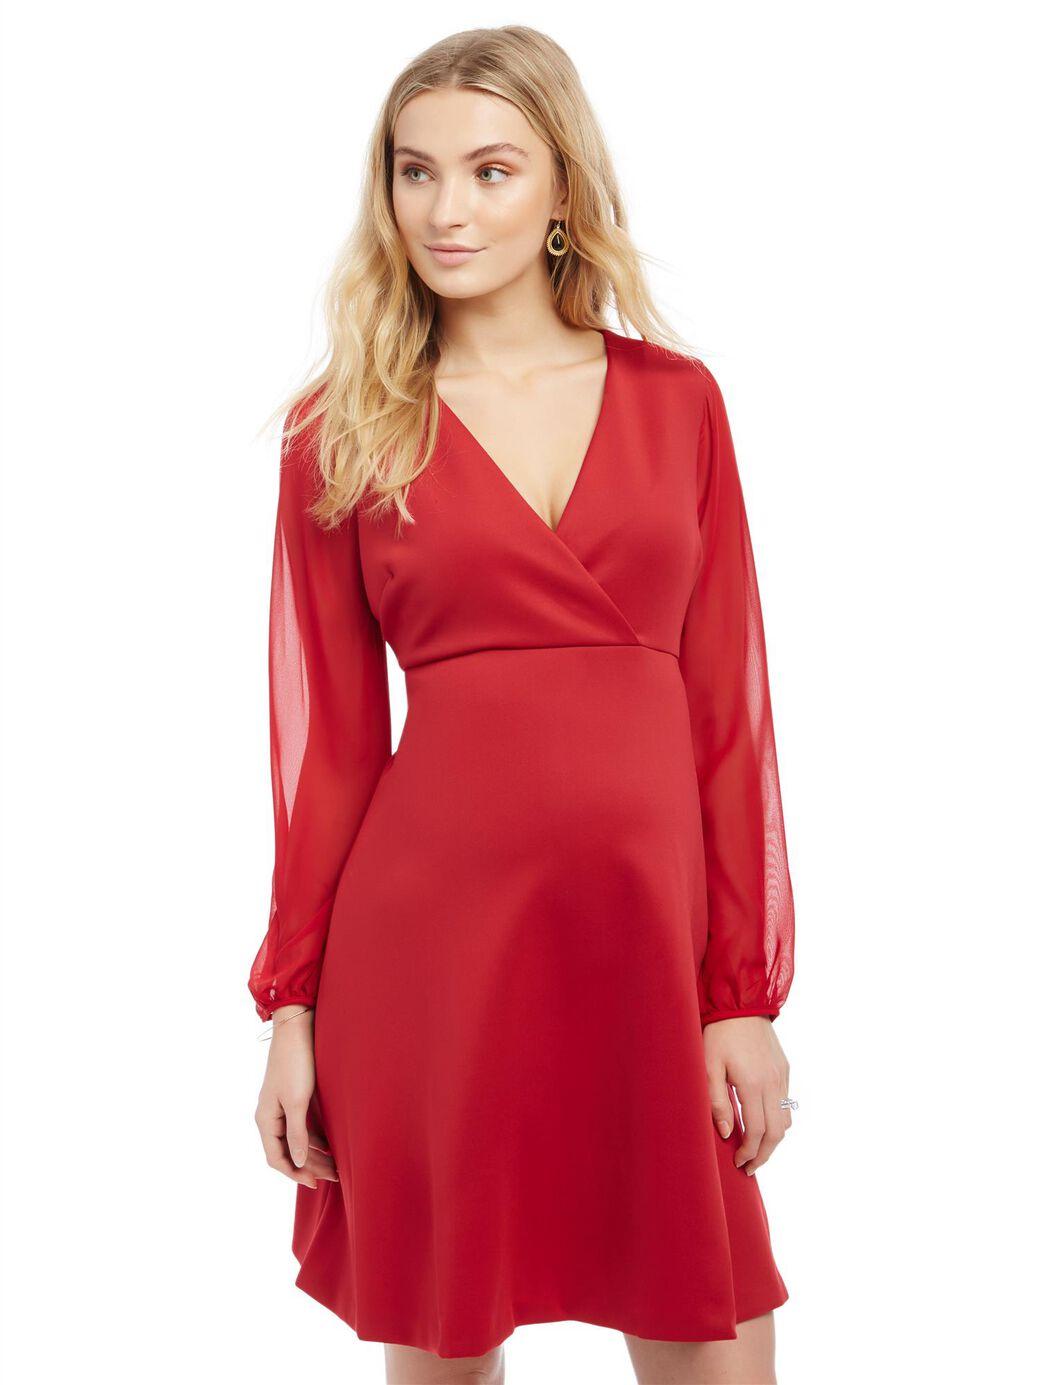 Sheer sleeve maternity dress motherhood maternity sheer sleeve maternity dress red ombrellifo Image collections